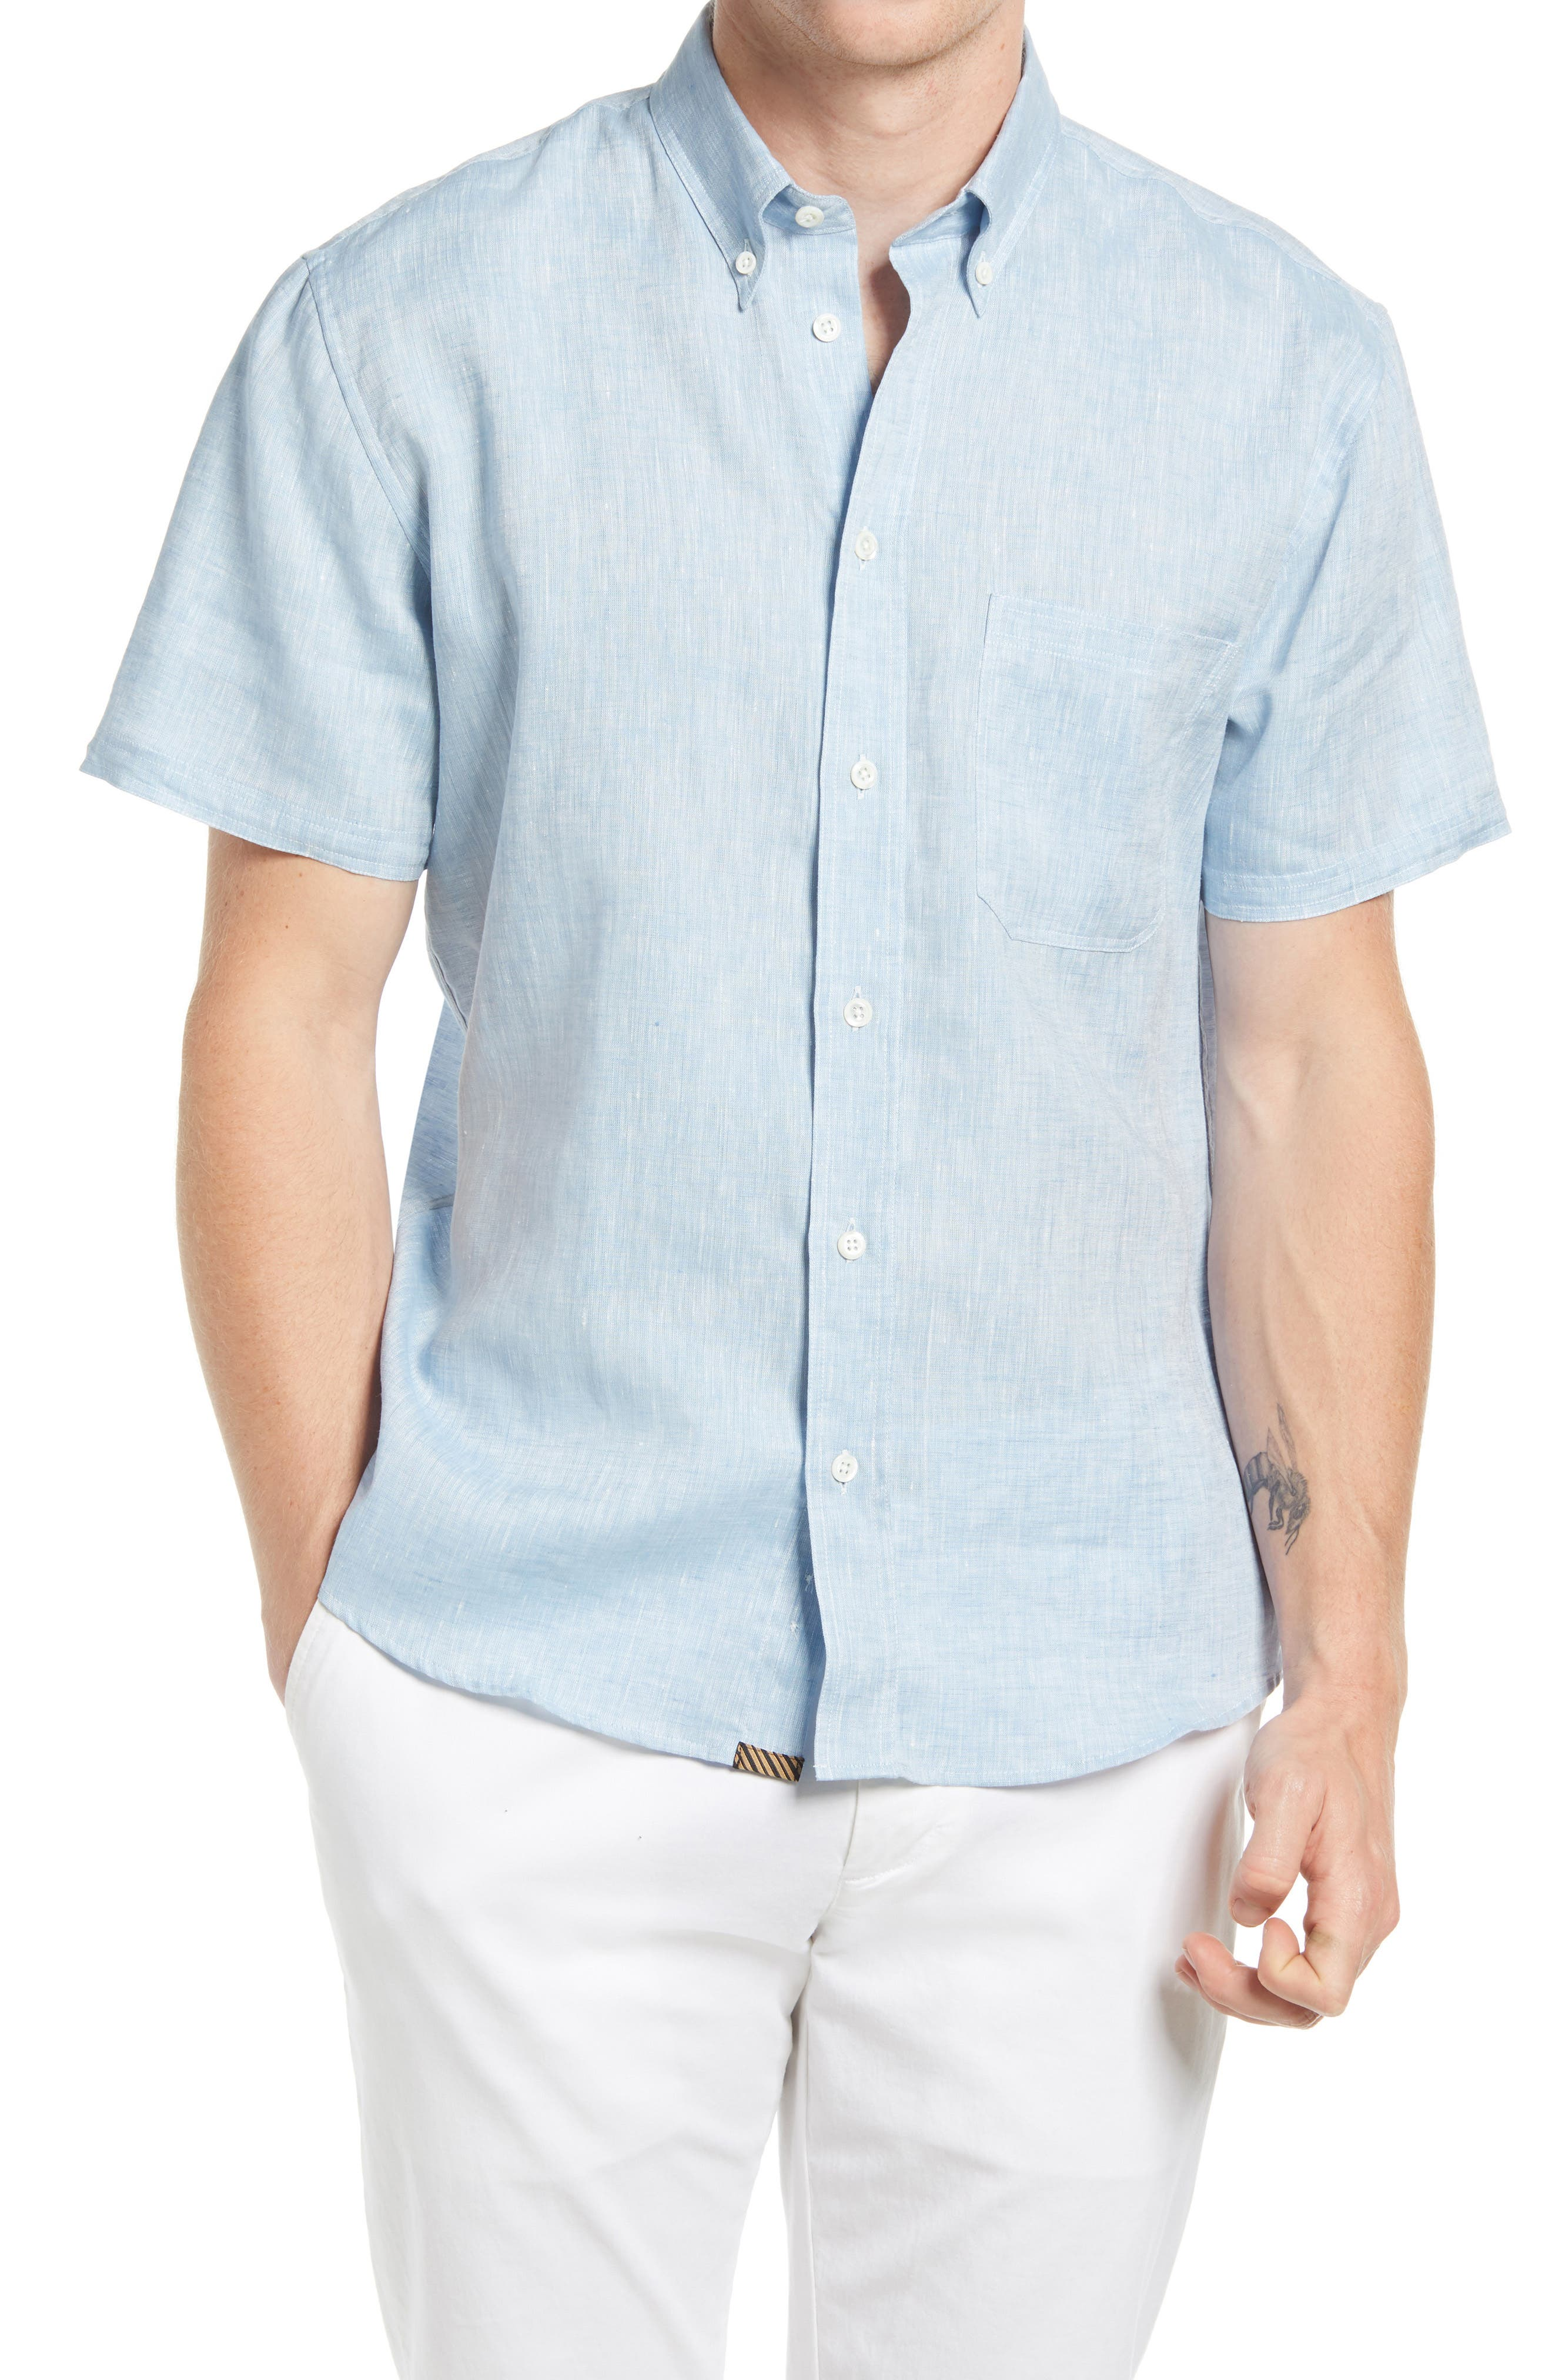 Tuscumbia Standard Fit Short Sleeve Button-Down Slub Linen Shirt